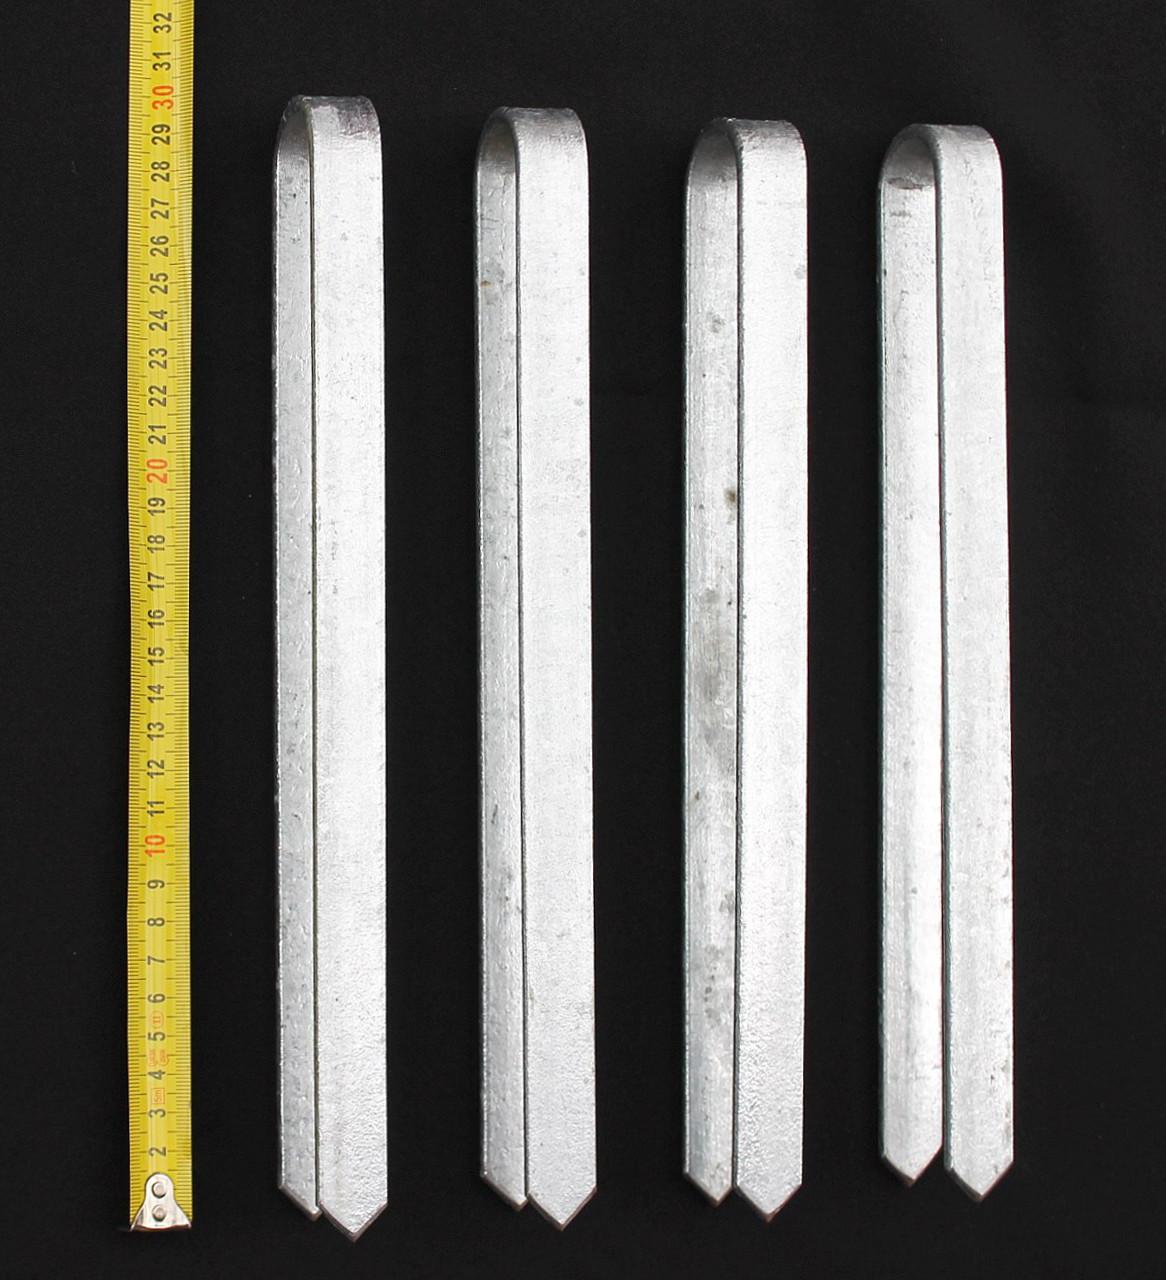 Bodenanker Erdanker feuerverzinkt Bodenhülse für Sarthe-WPC-Pfosten